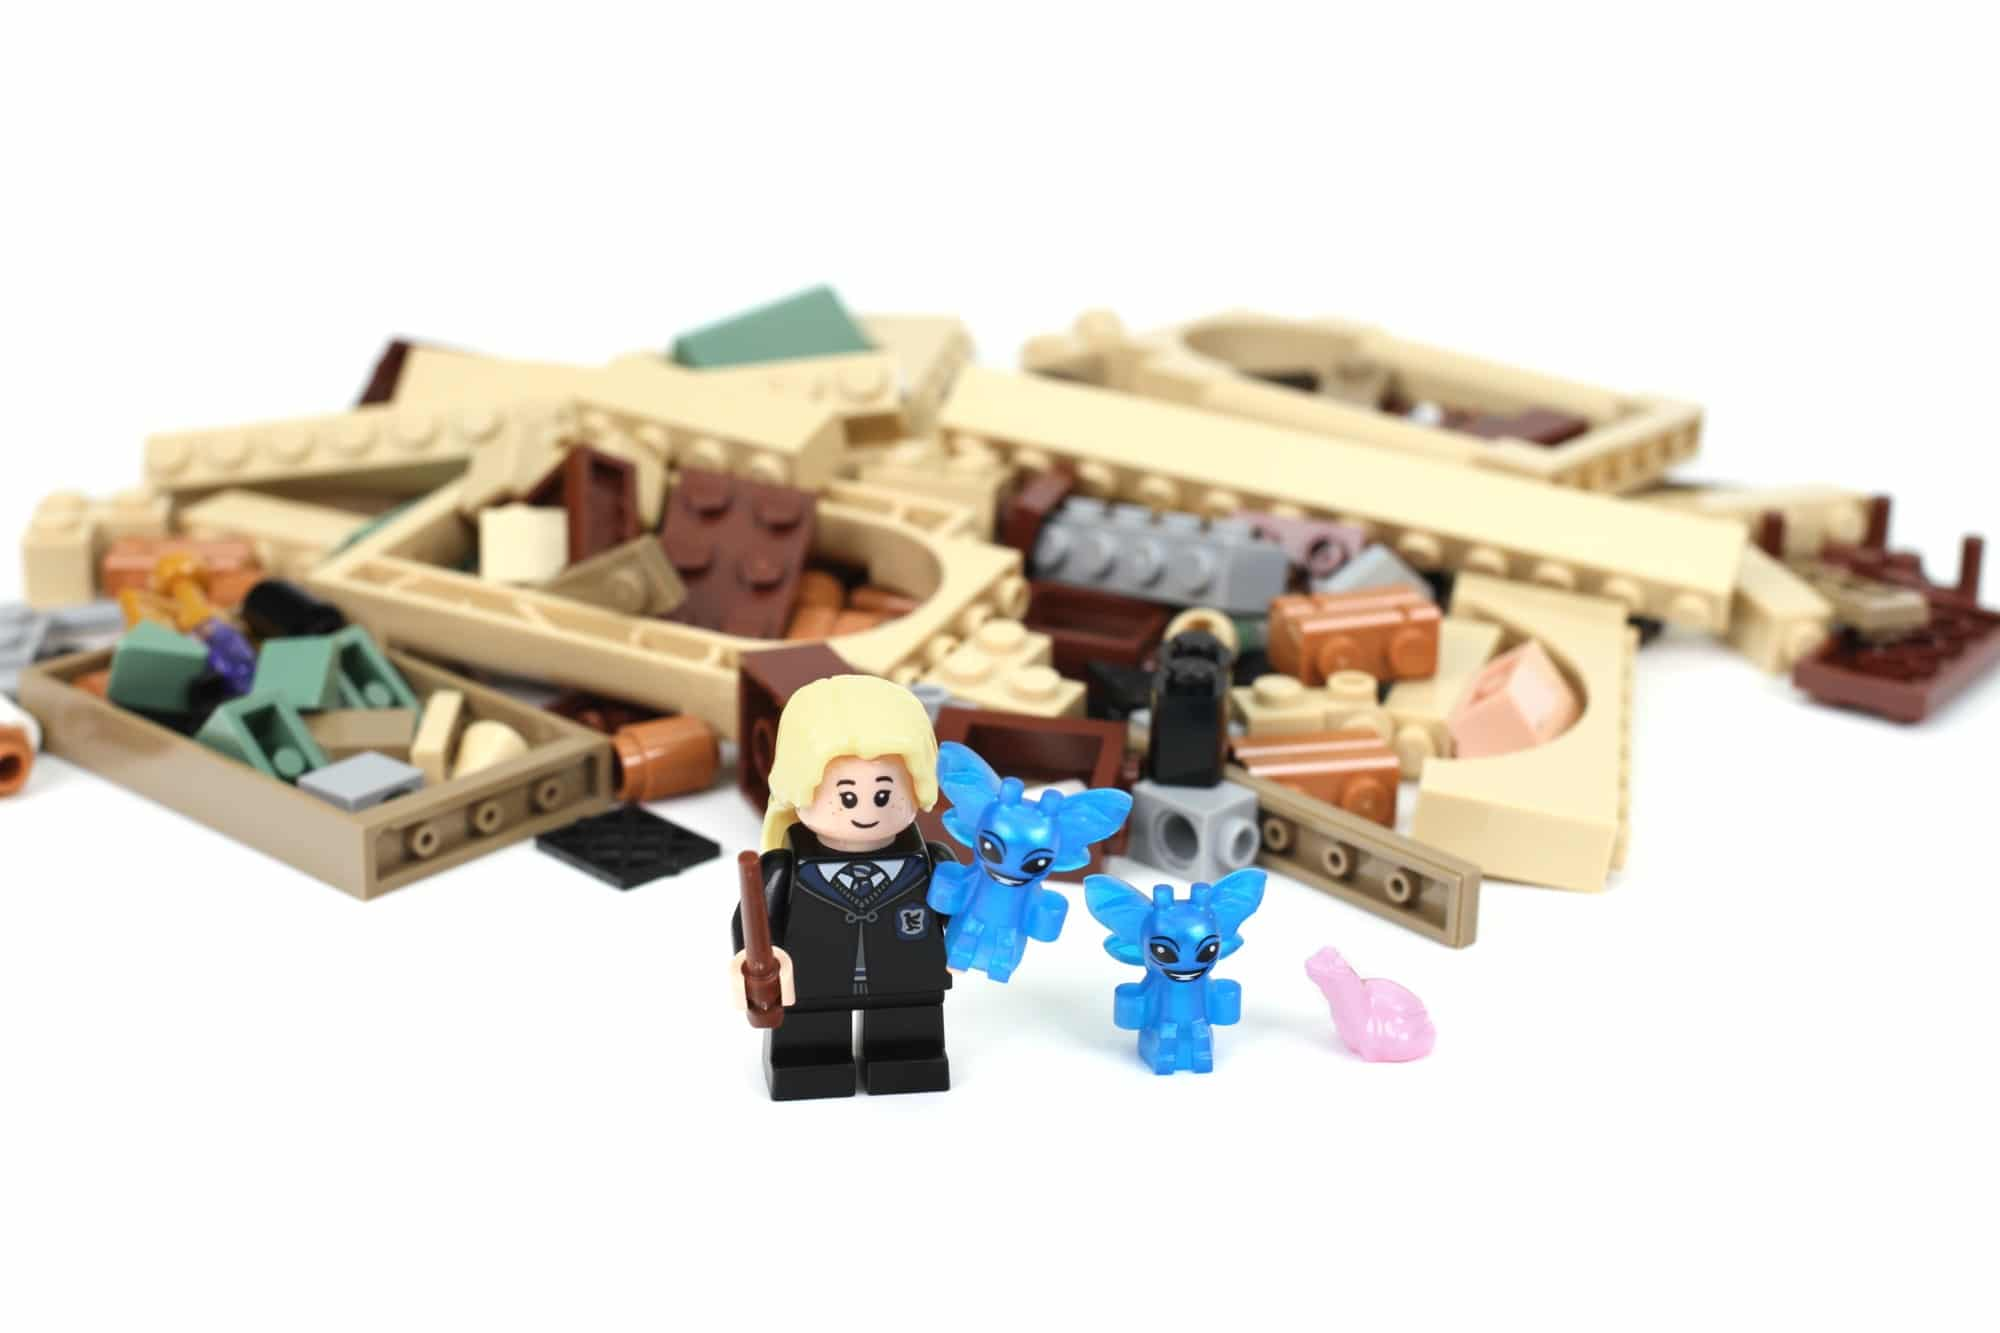 LEGO Harry Potter 76389 Hogwarts Kammer Des Schreckens Schritt 2 1